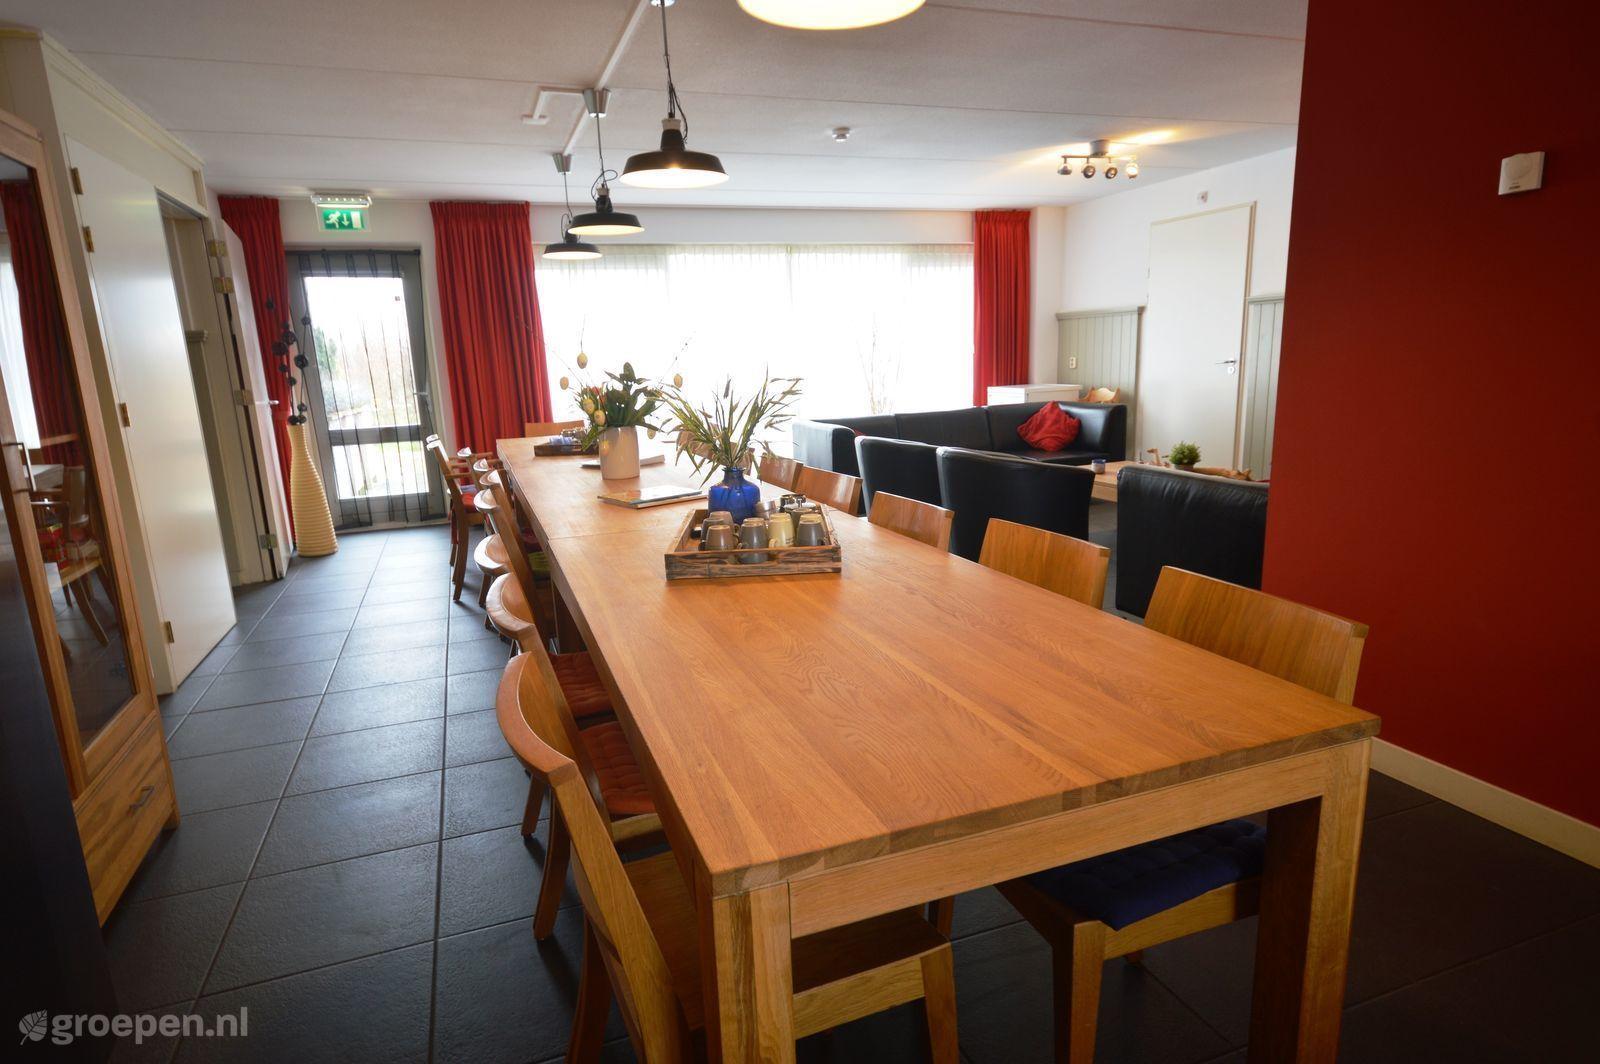 Group accommodation Giethoorn